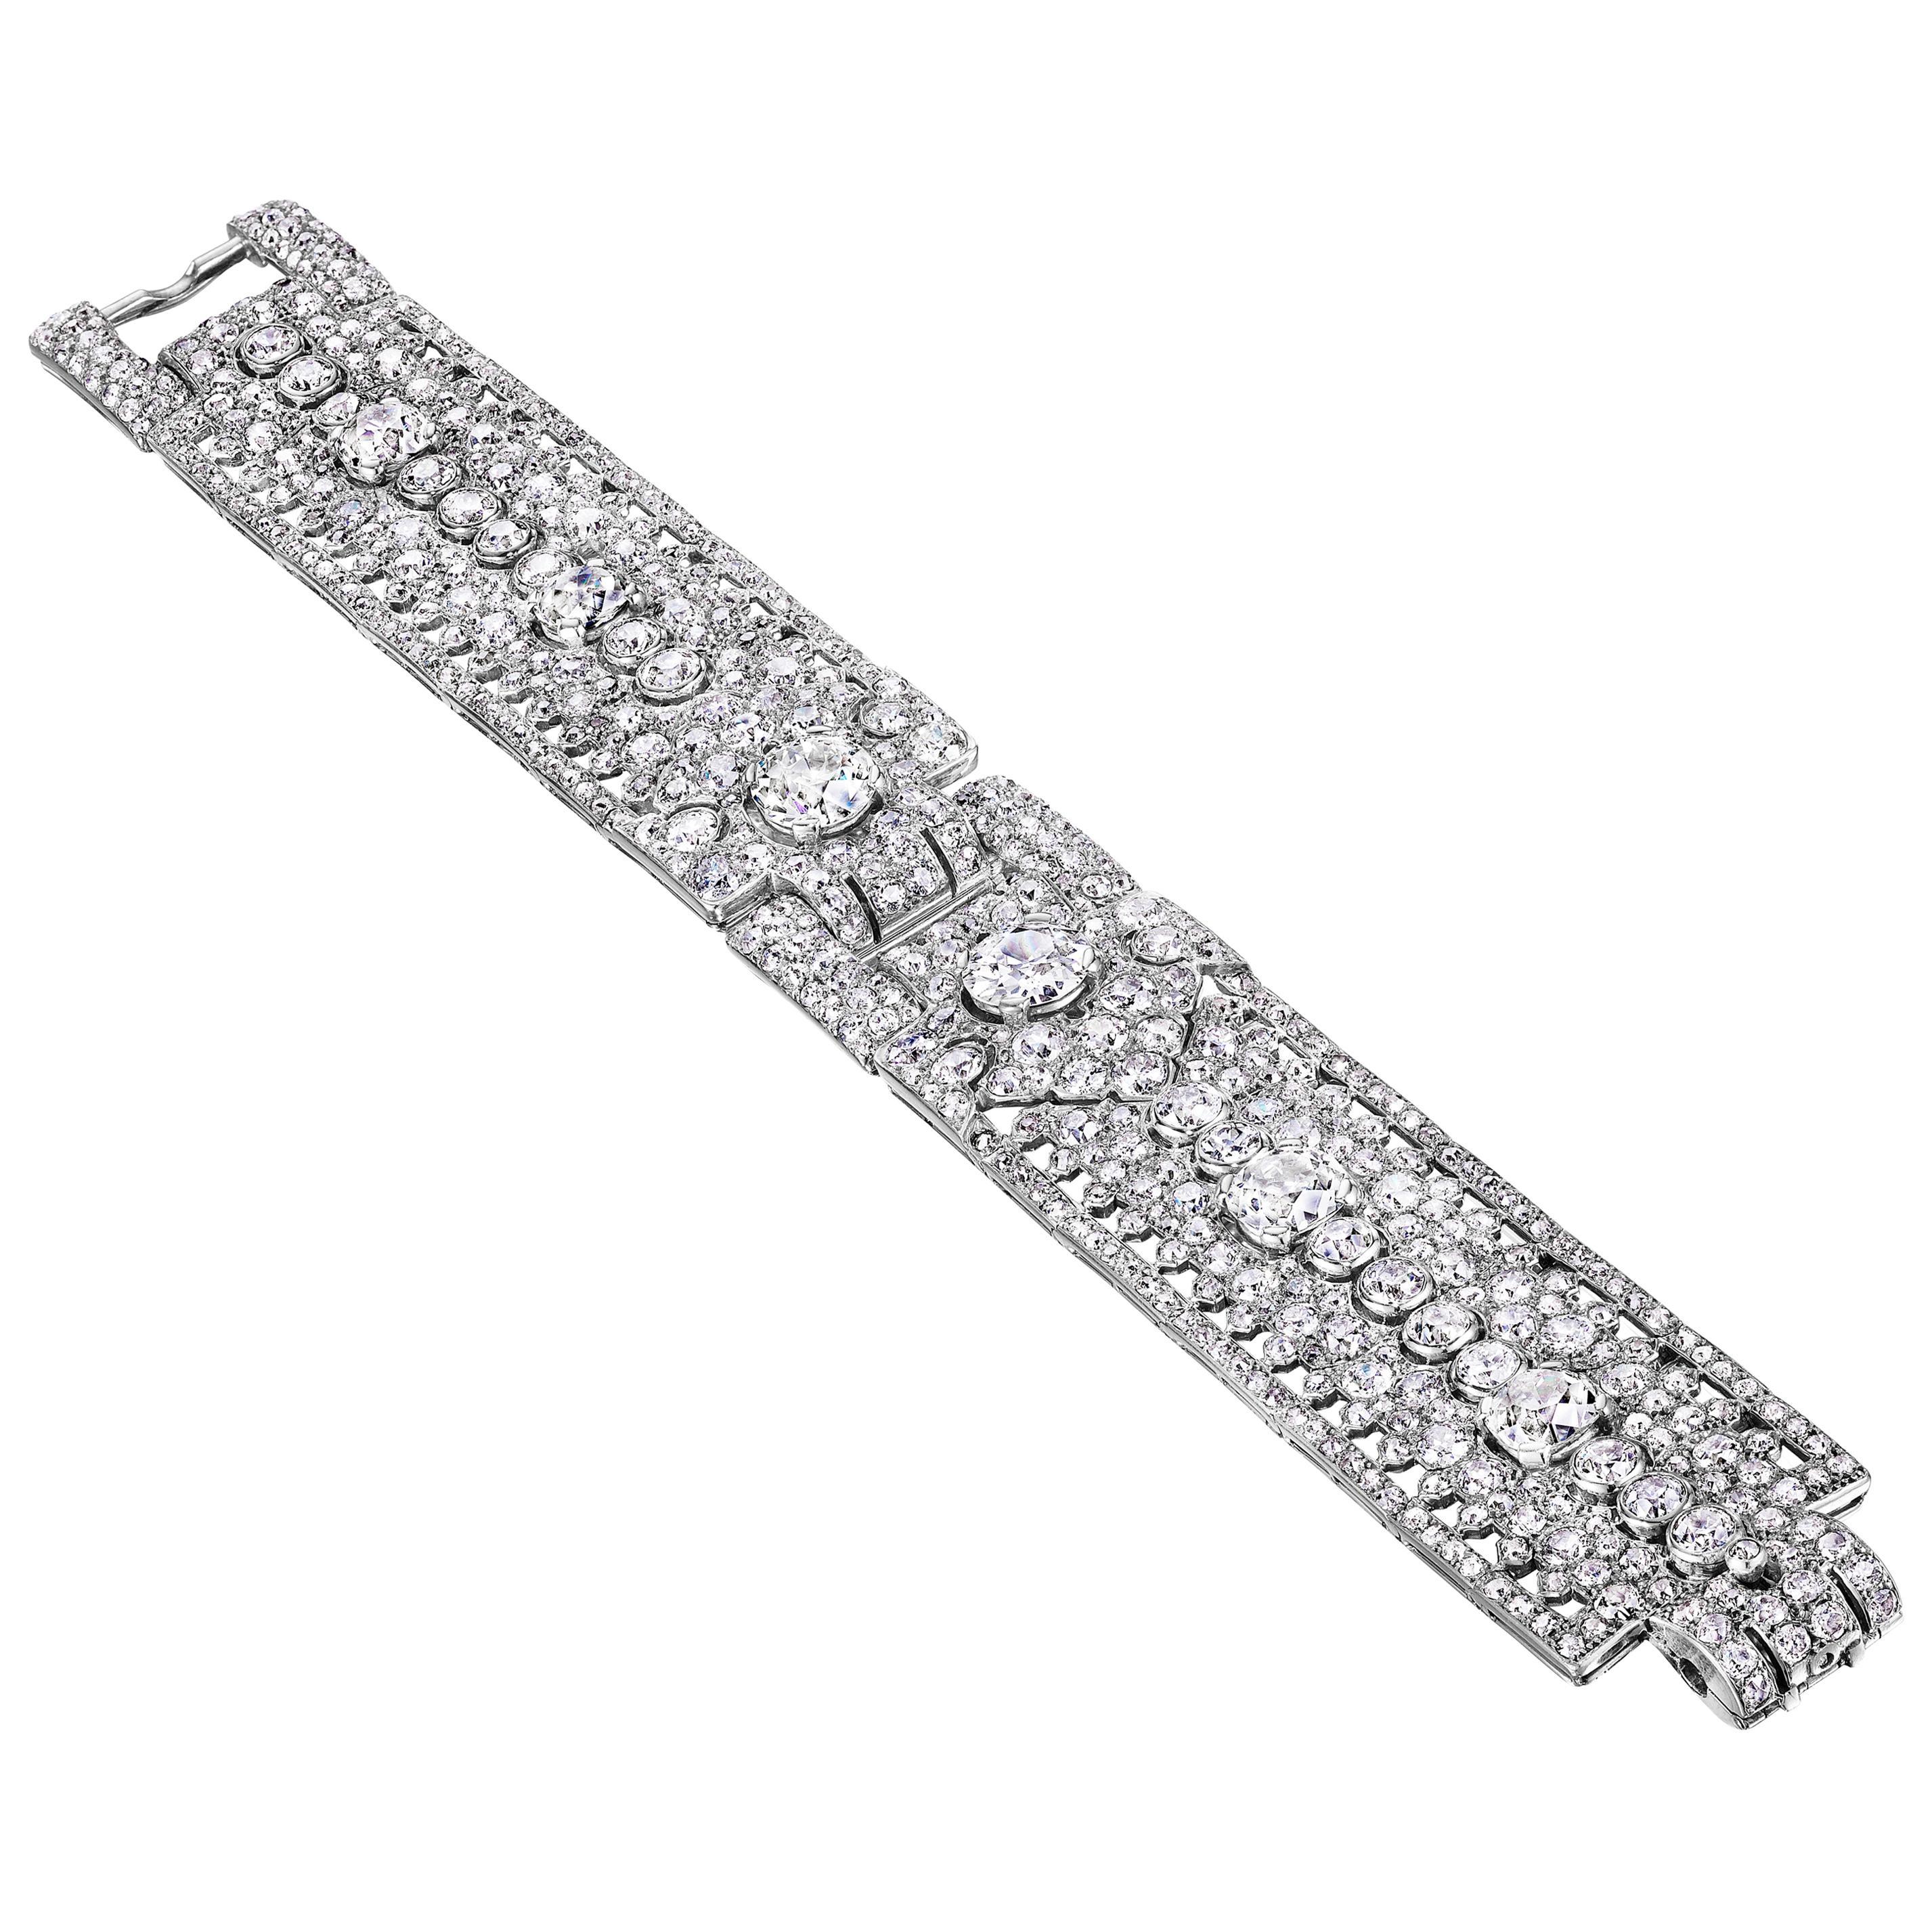 Cartier Paris Art Deco Flexible Diamond Bracelet, circa 1930